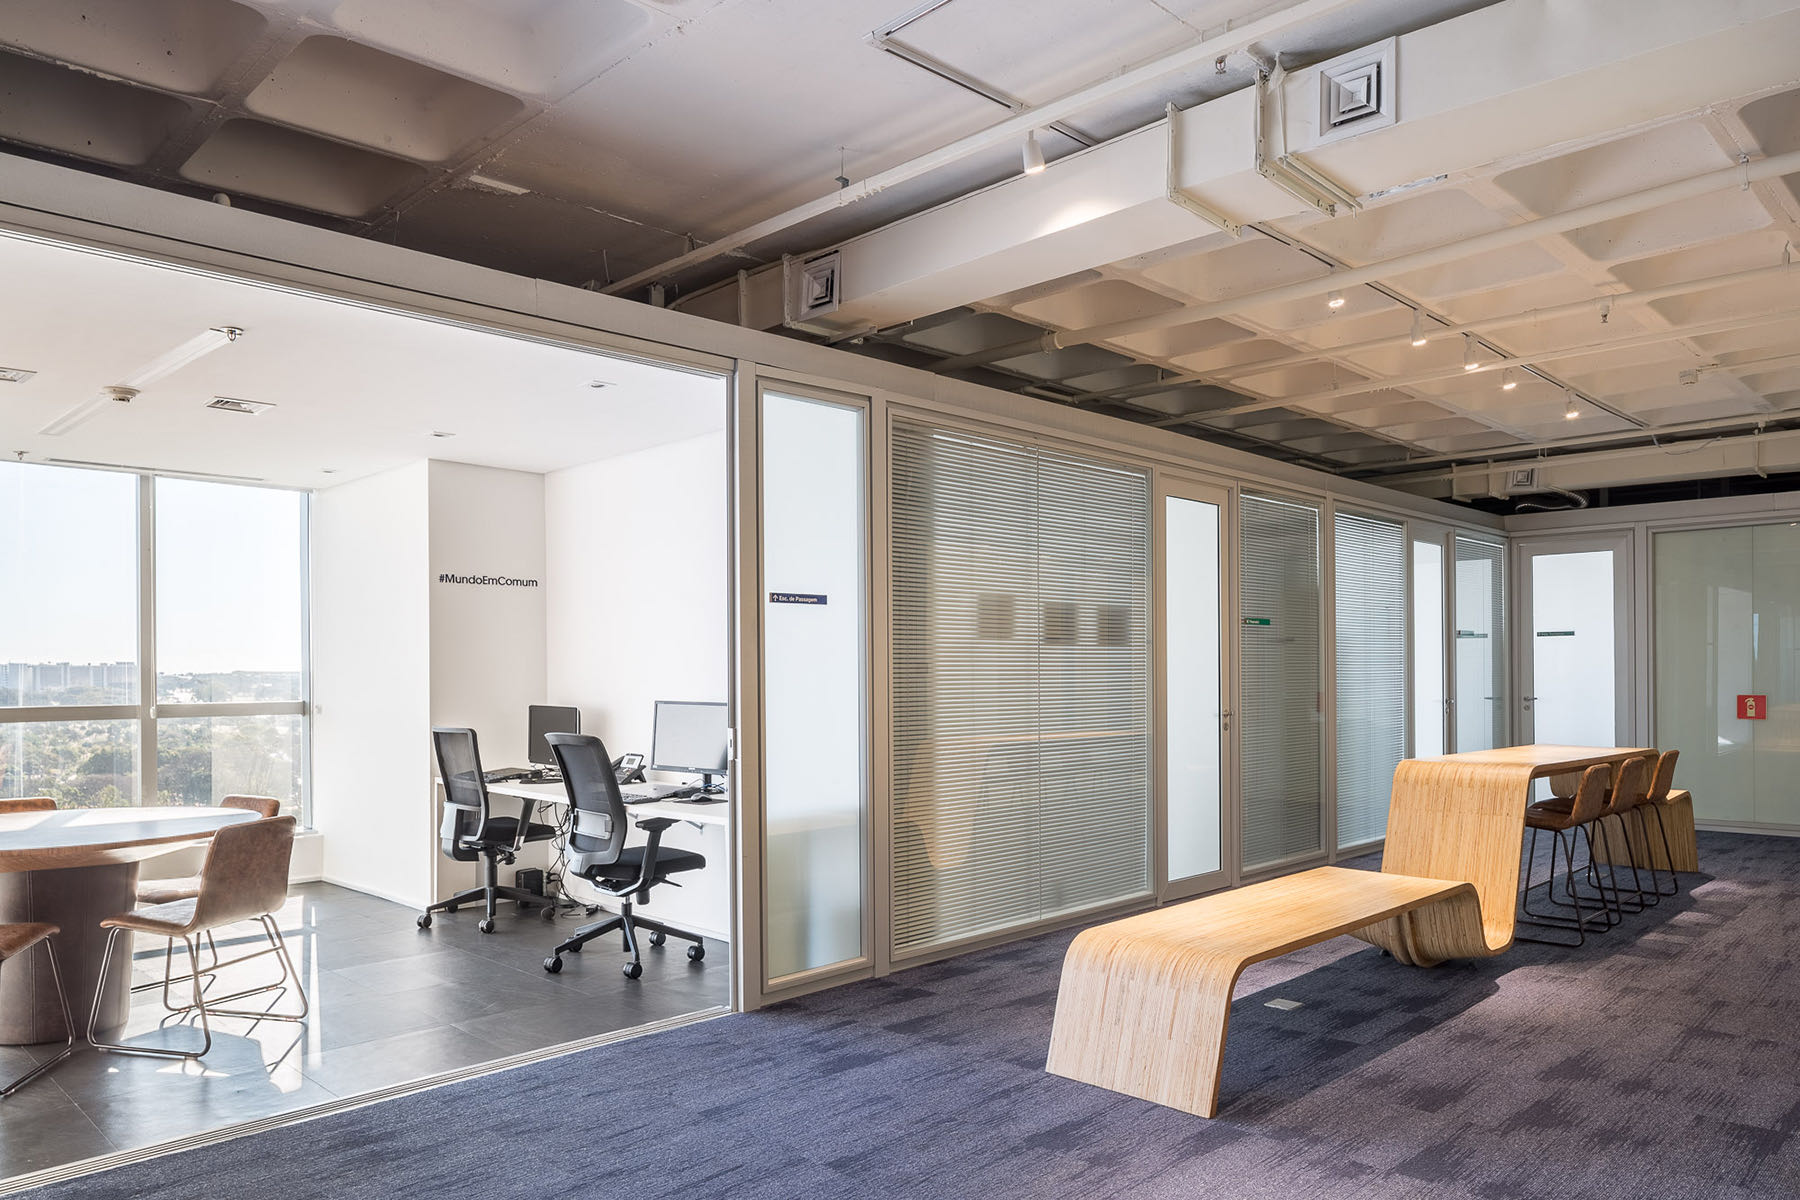 french-development-agency-office-1